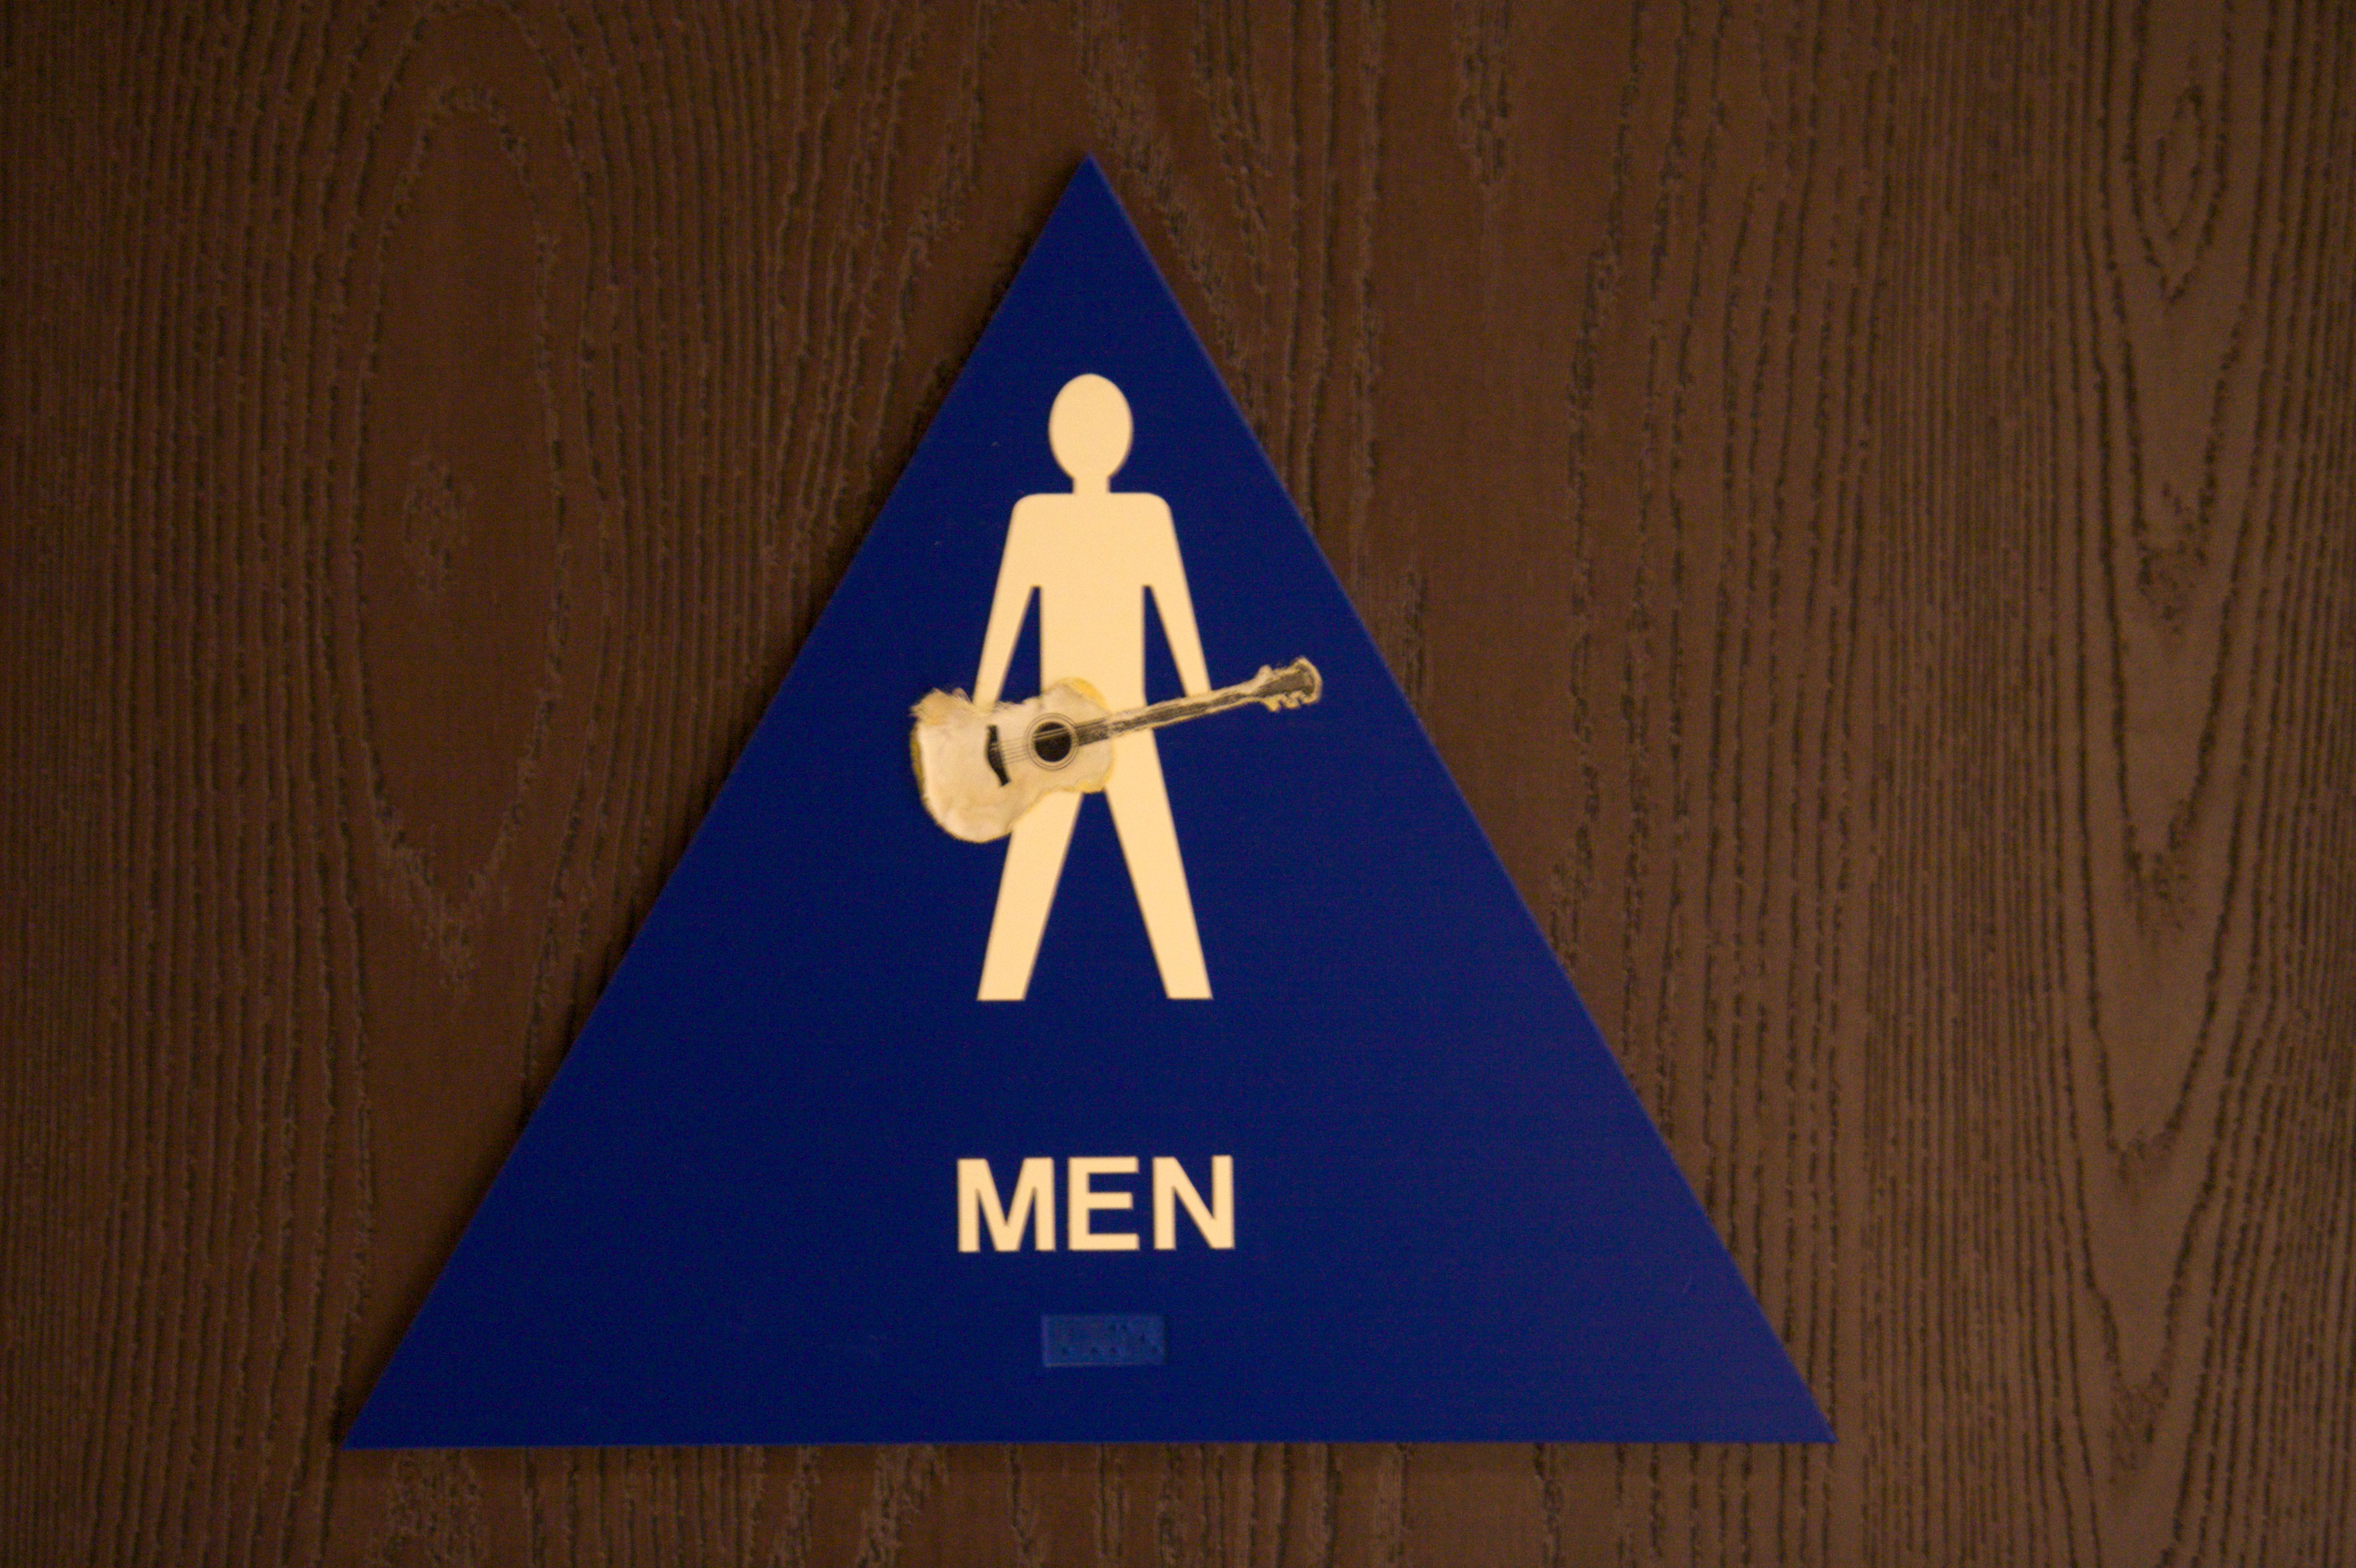 Bathroom Signs History file:tgft06 restroom sign for men - taylor guitar factory